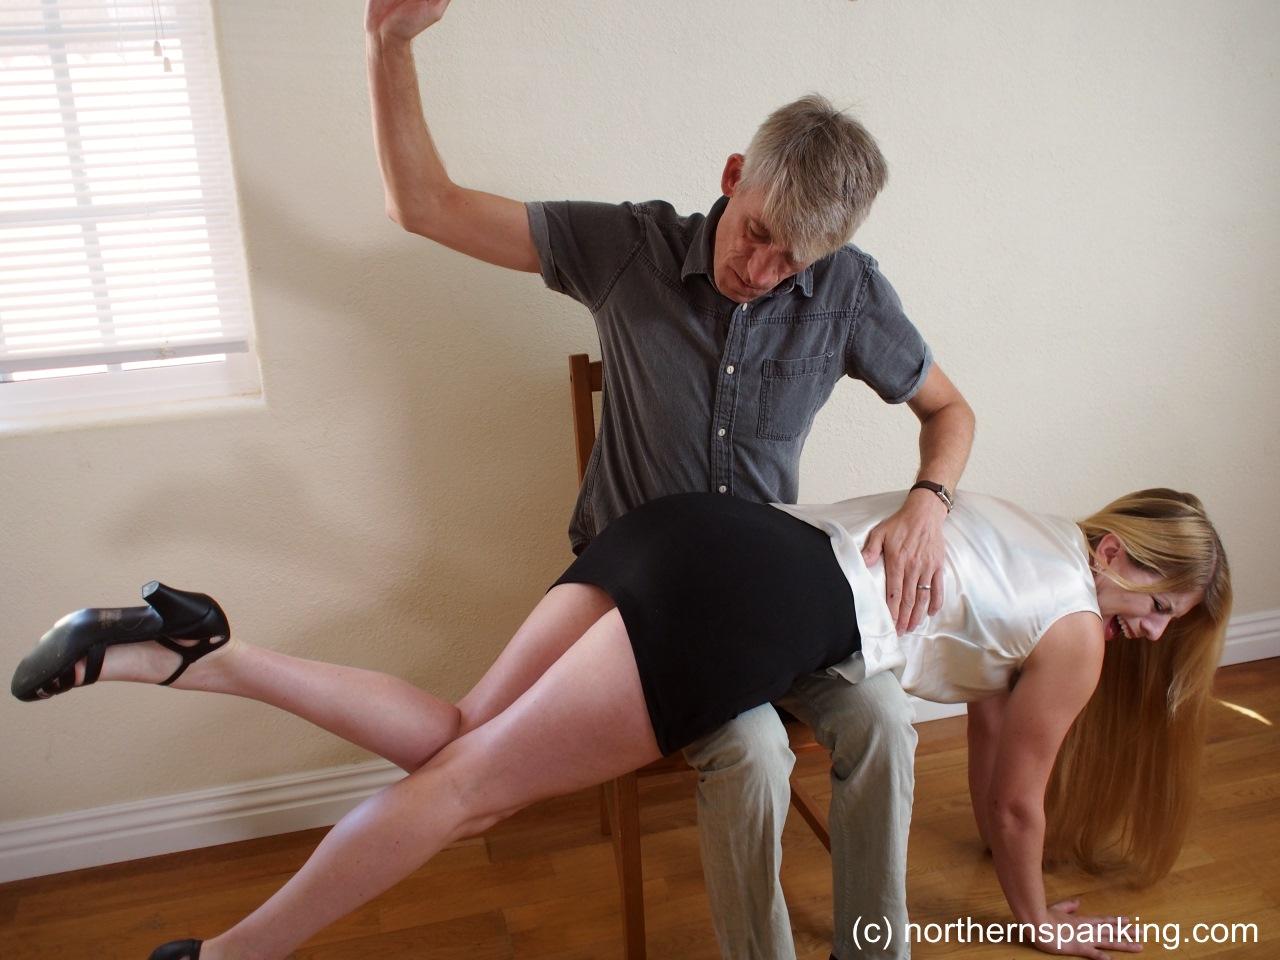 Consider, School gitls naked spanking authoritative point